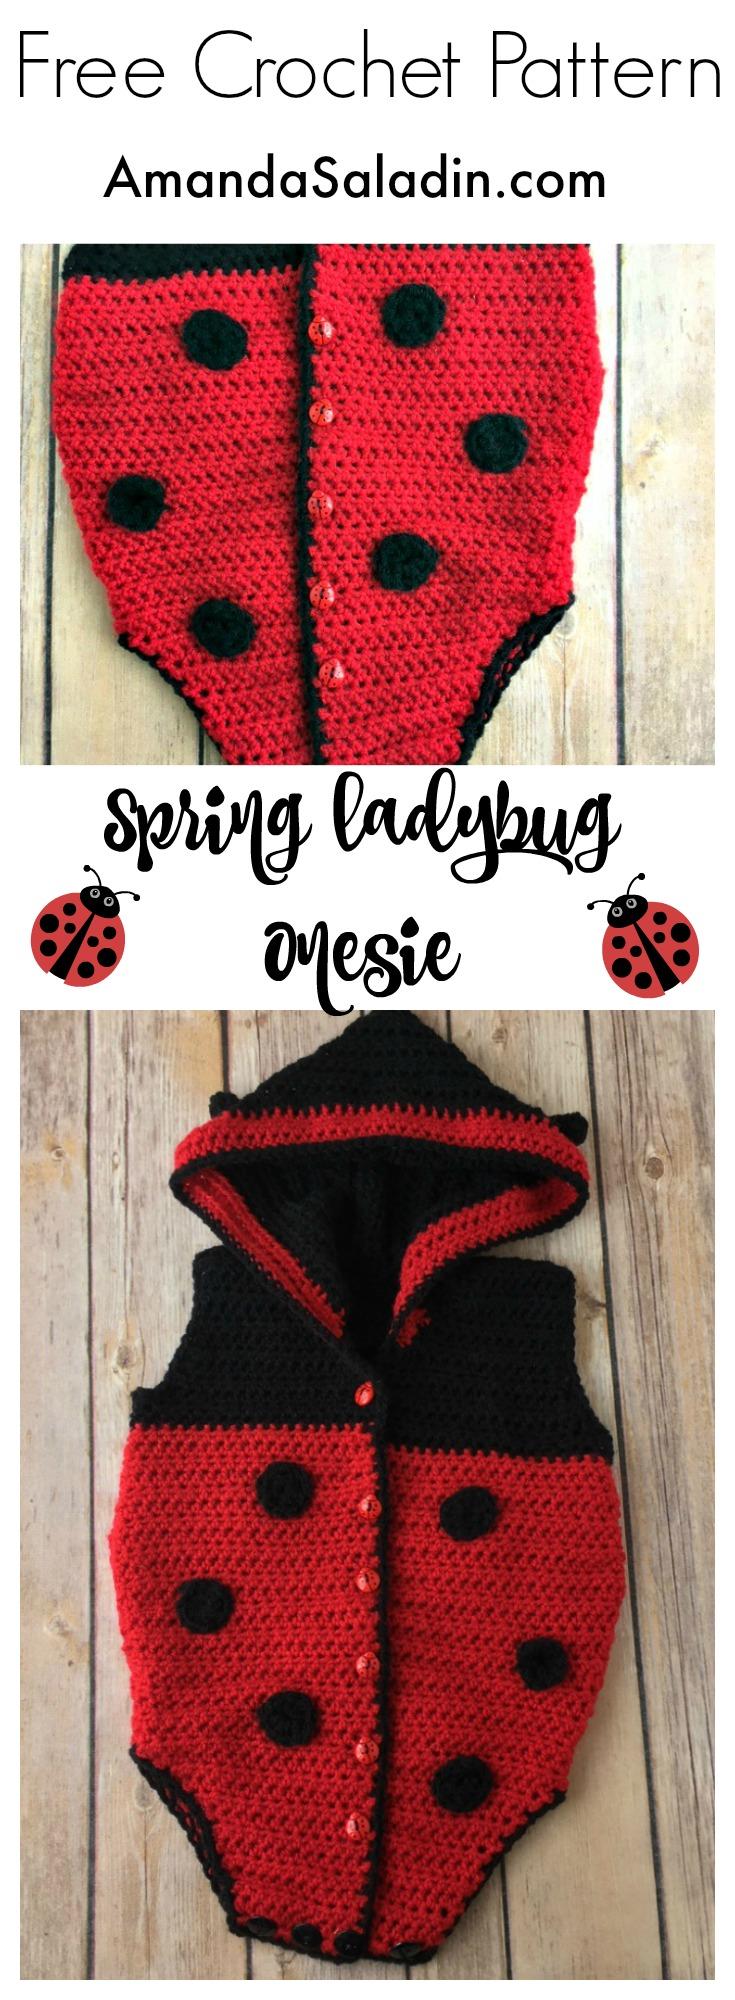 Free Crochet Pattern - Spring Ladybug Onesie